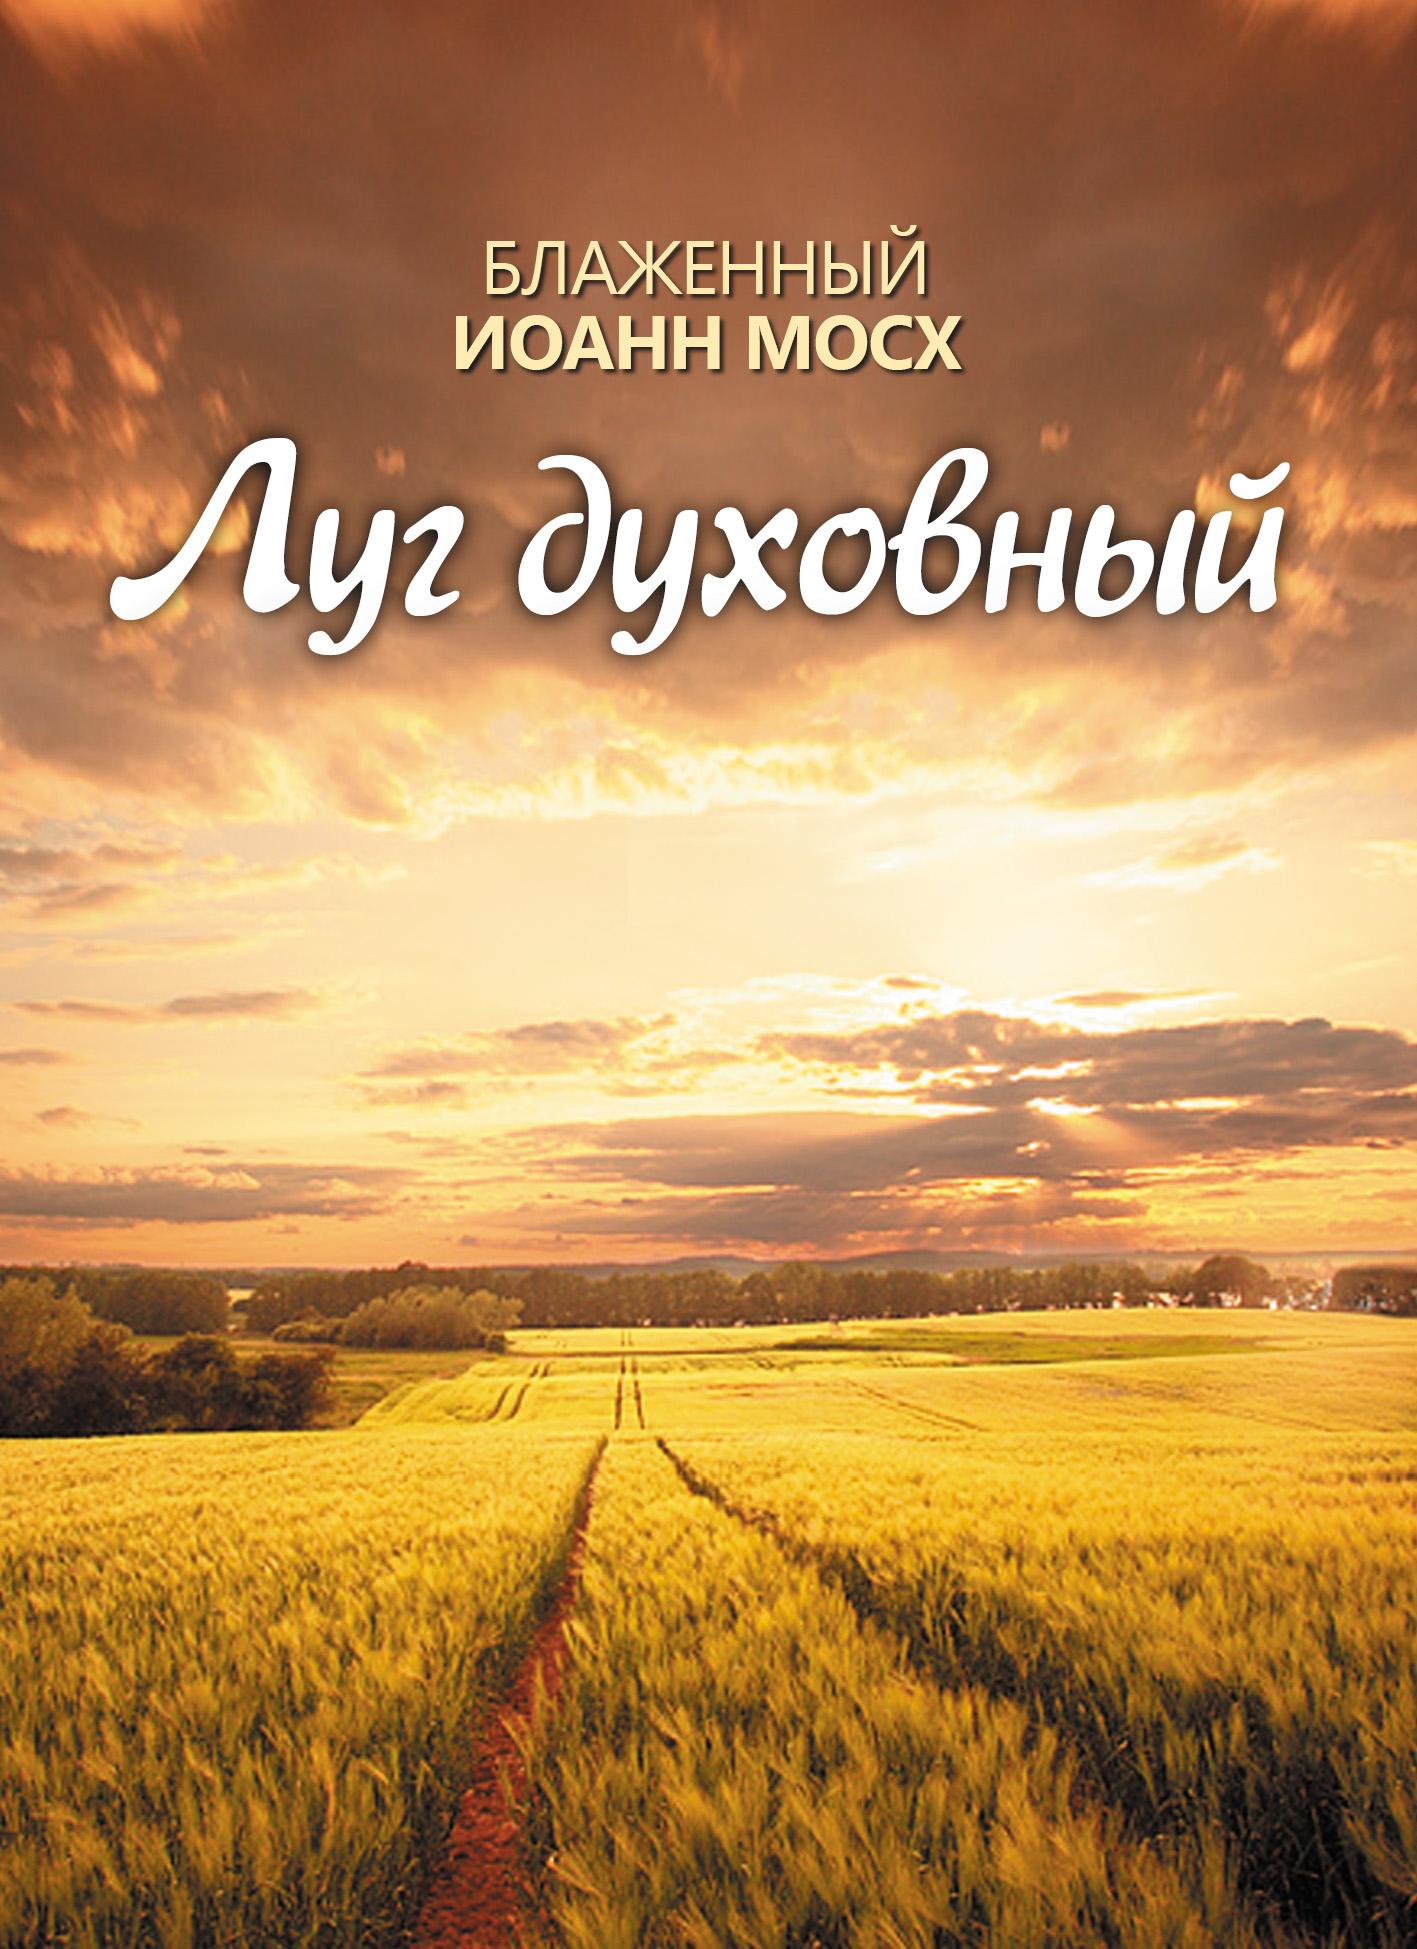 Блаженный Иоанн Мосх Луг духовный блаженный иоанн мосх луг духовный творение блаженного иоанна мосха